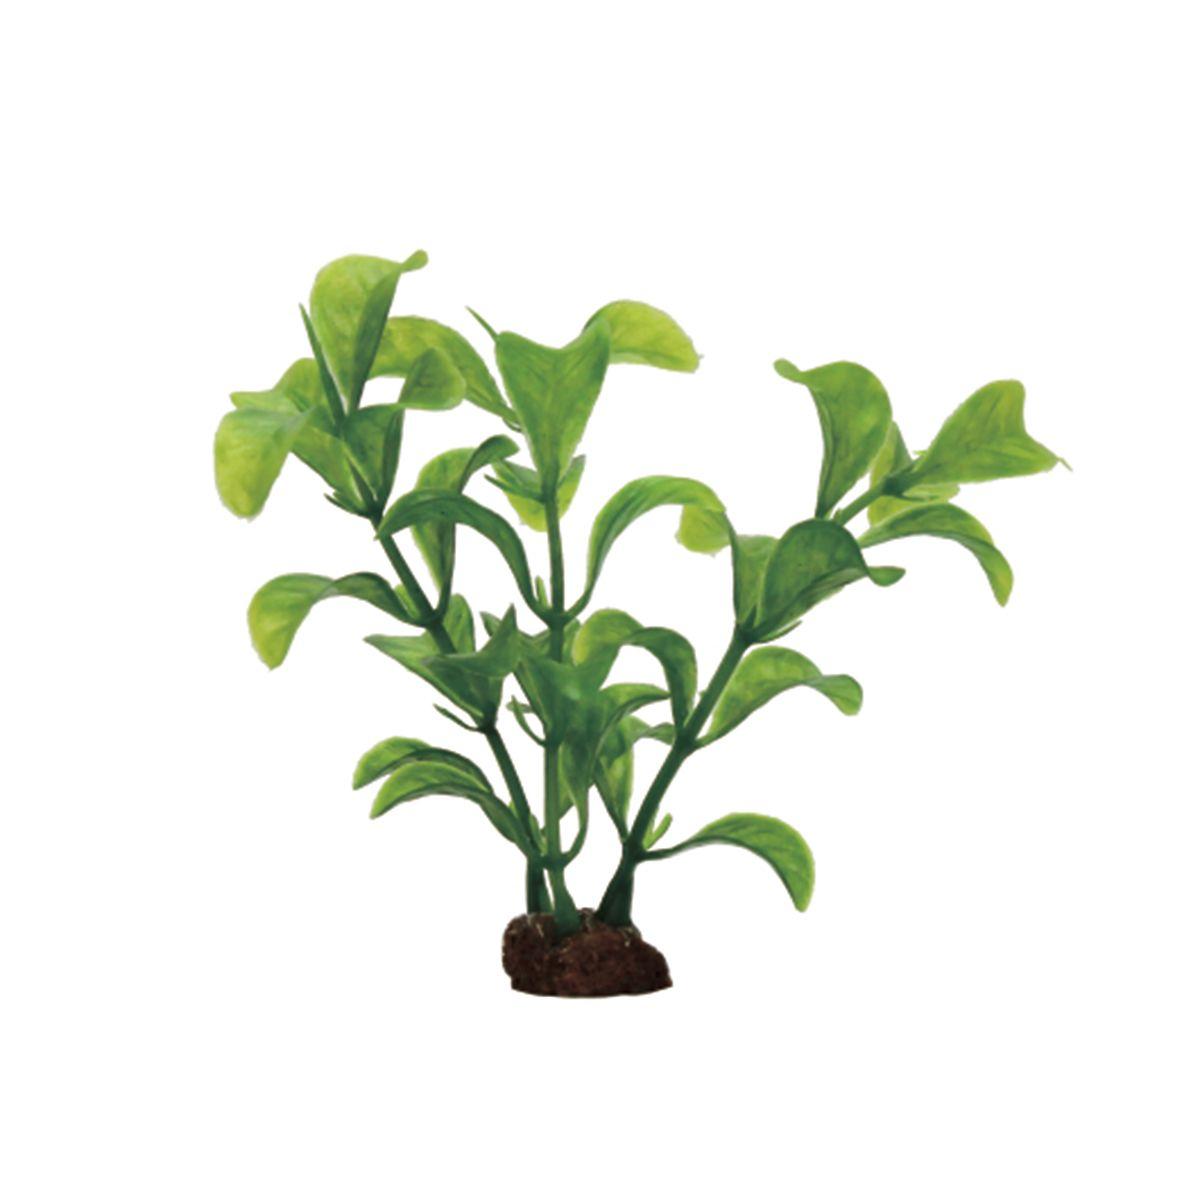 Растение для аквариума ArtUniq Людвигия зеленая, высота 10 см, 6 штART-1170521Растение для аквариума ArtUniq Людвигия зеленая, высота 10 см, 6 шт